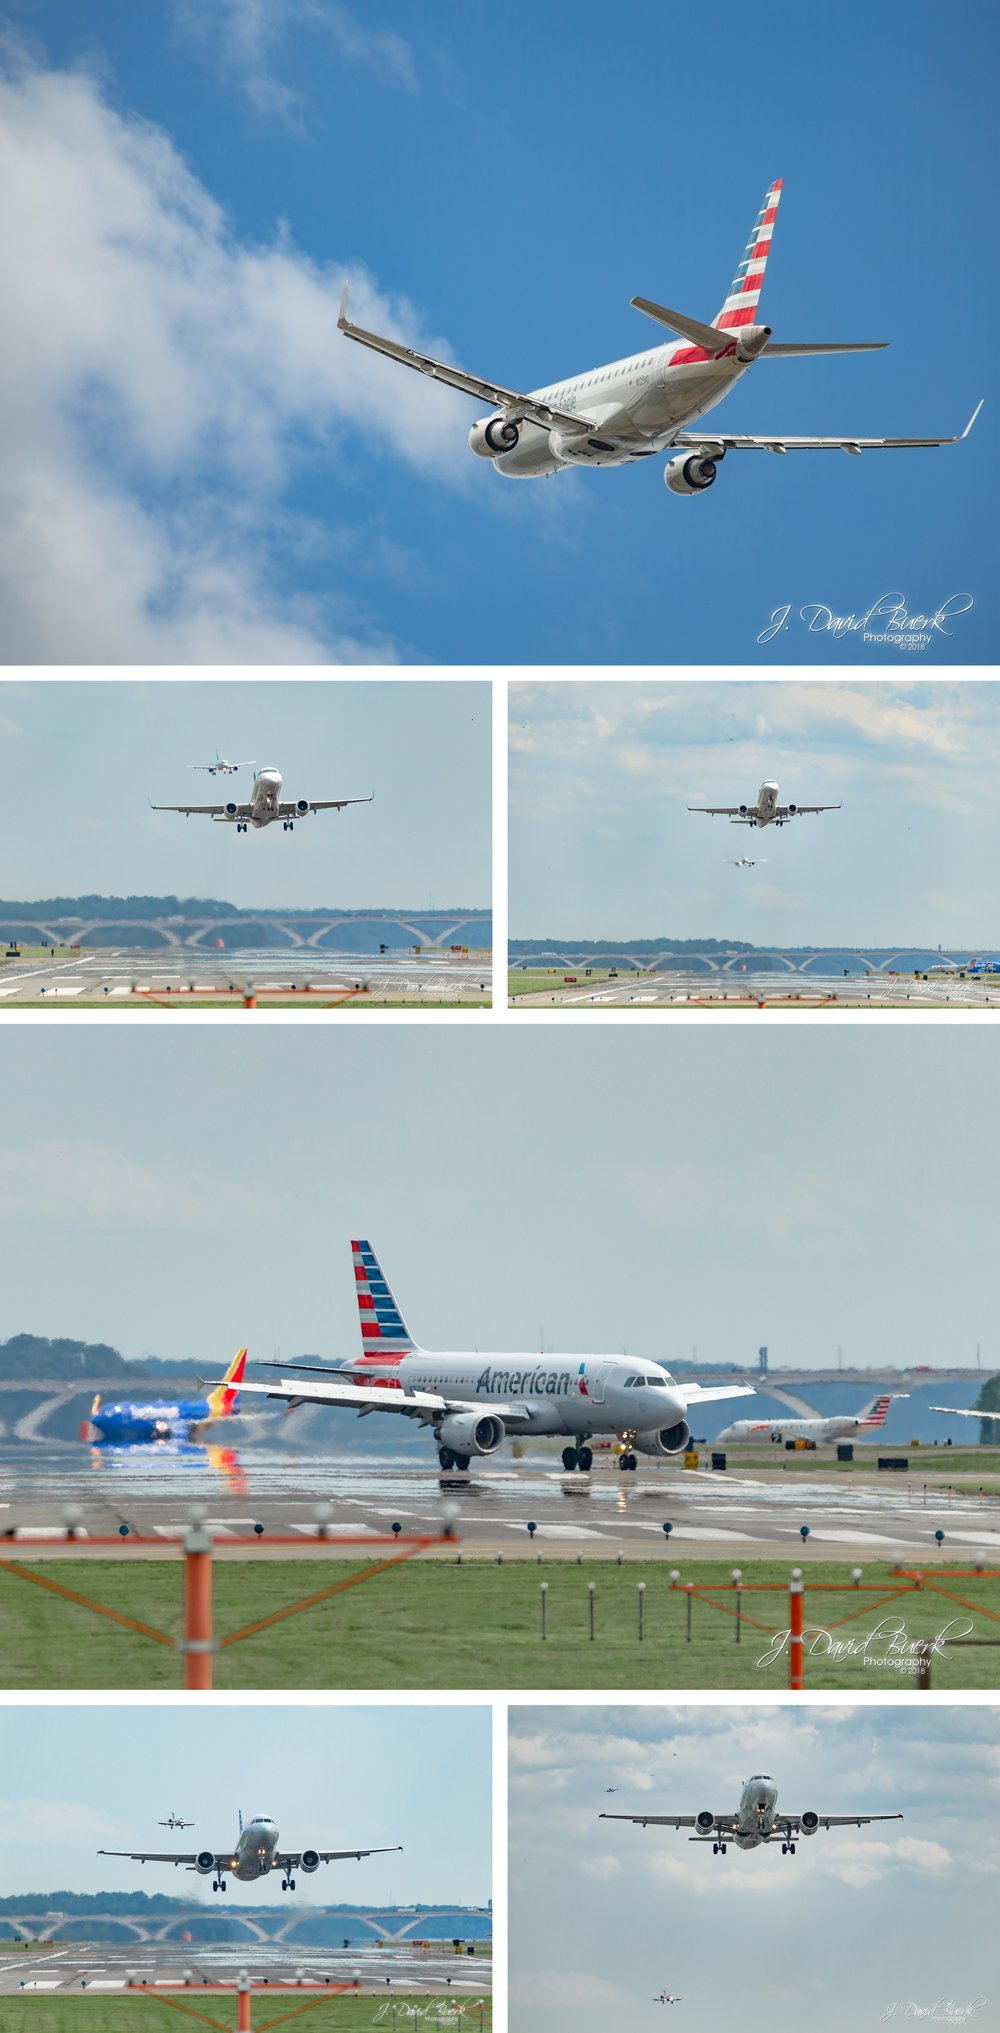 20180605 DCA Planespotting 3.jpg